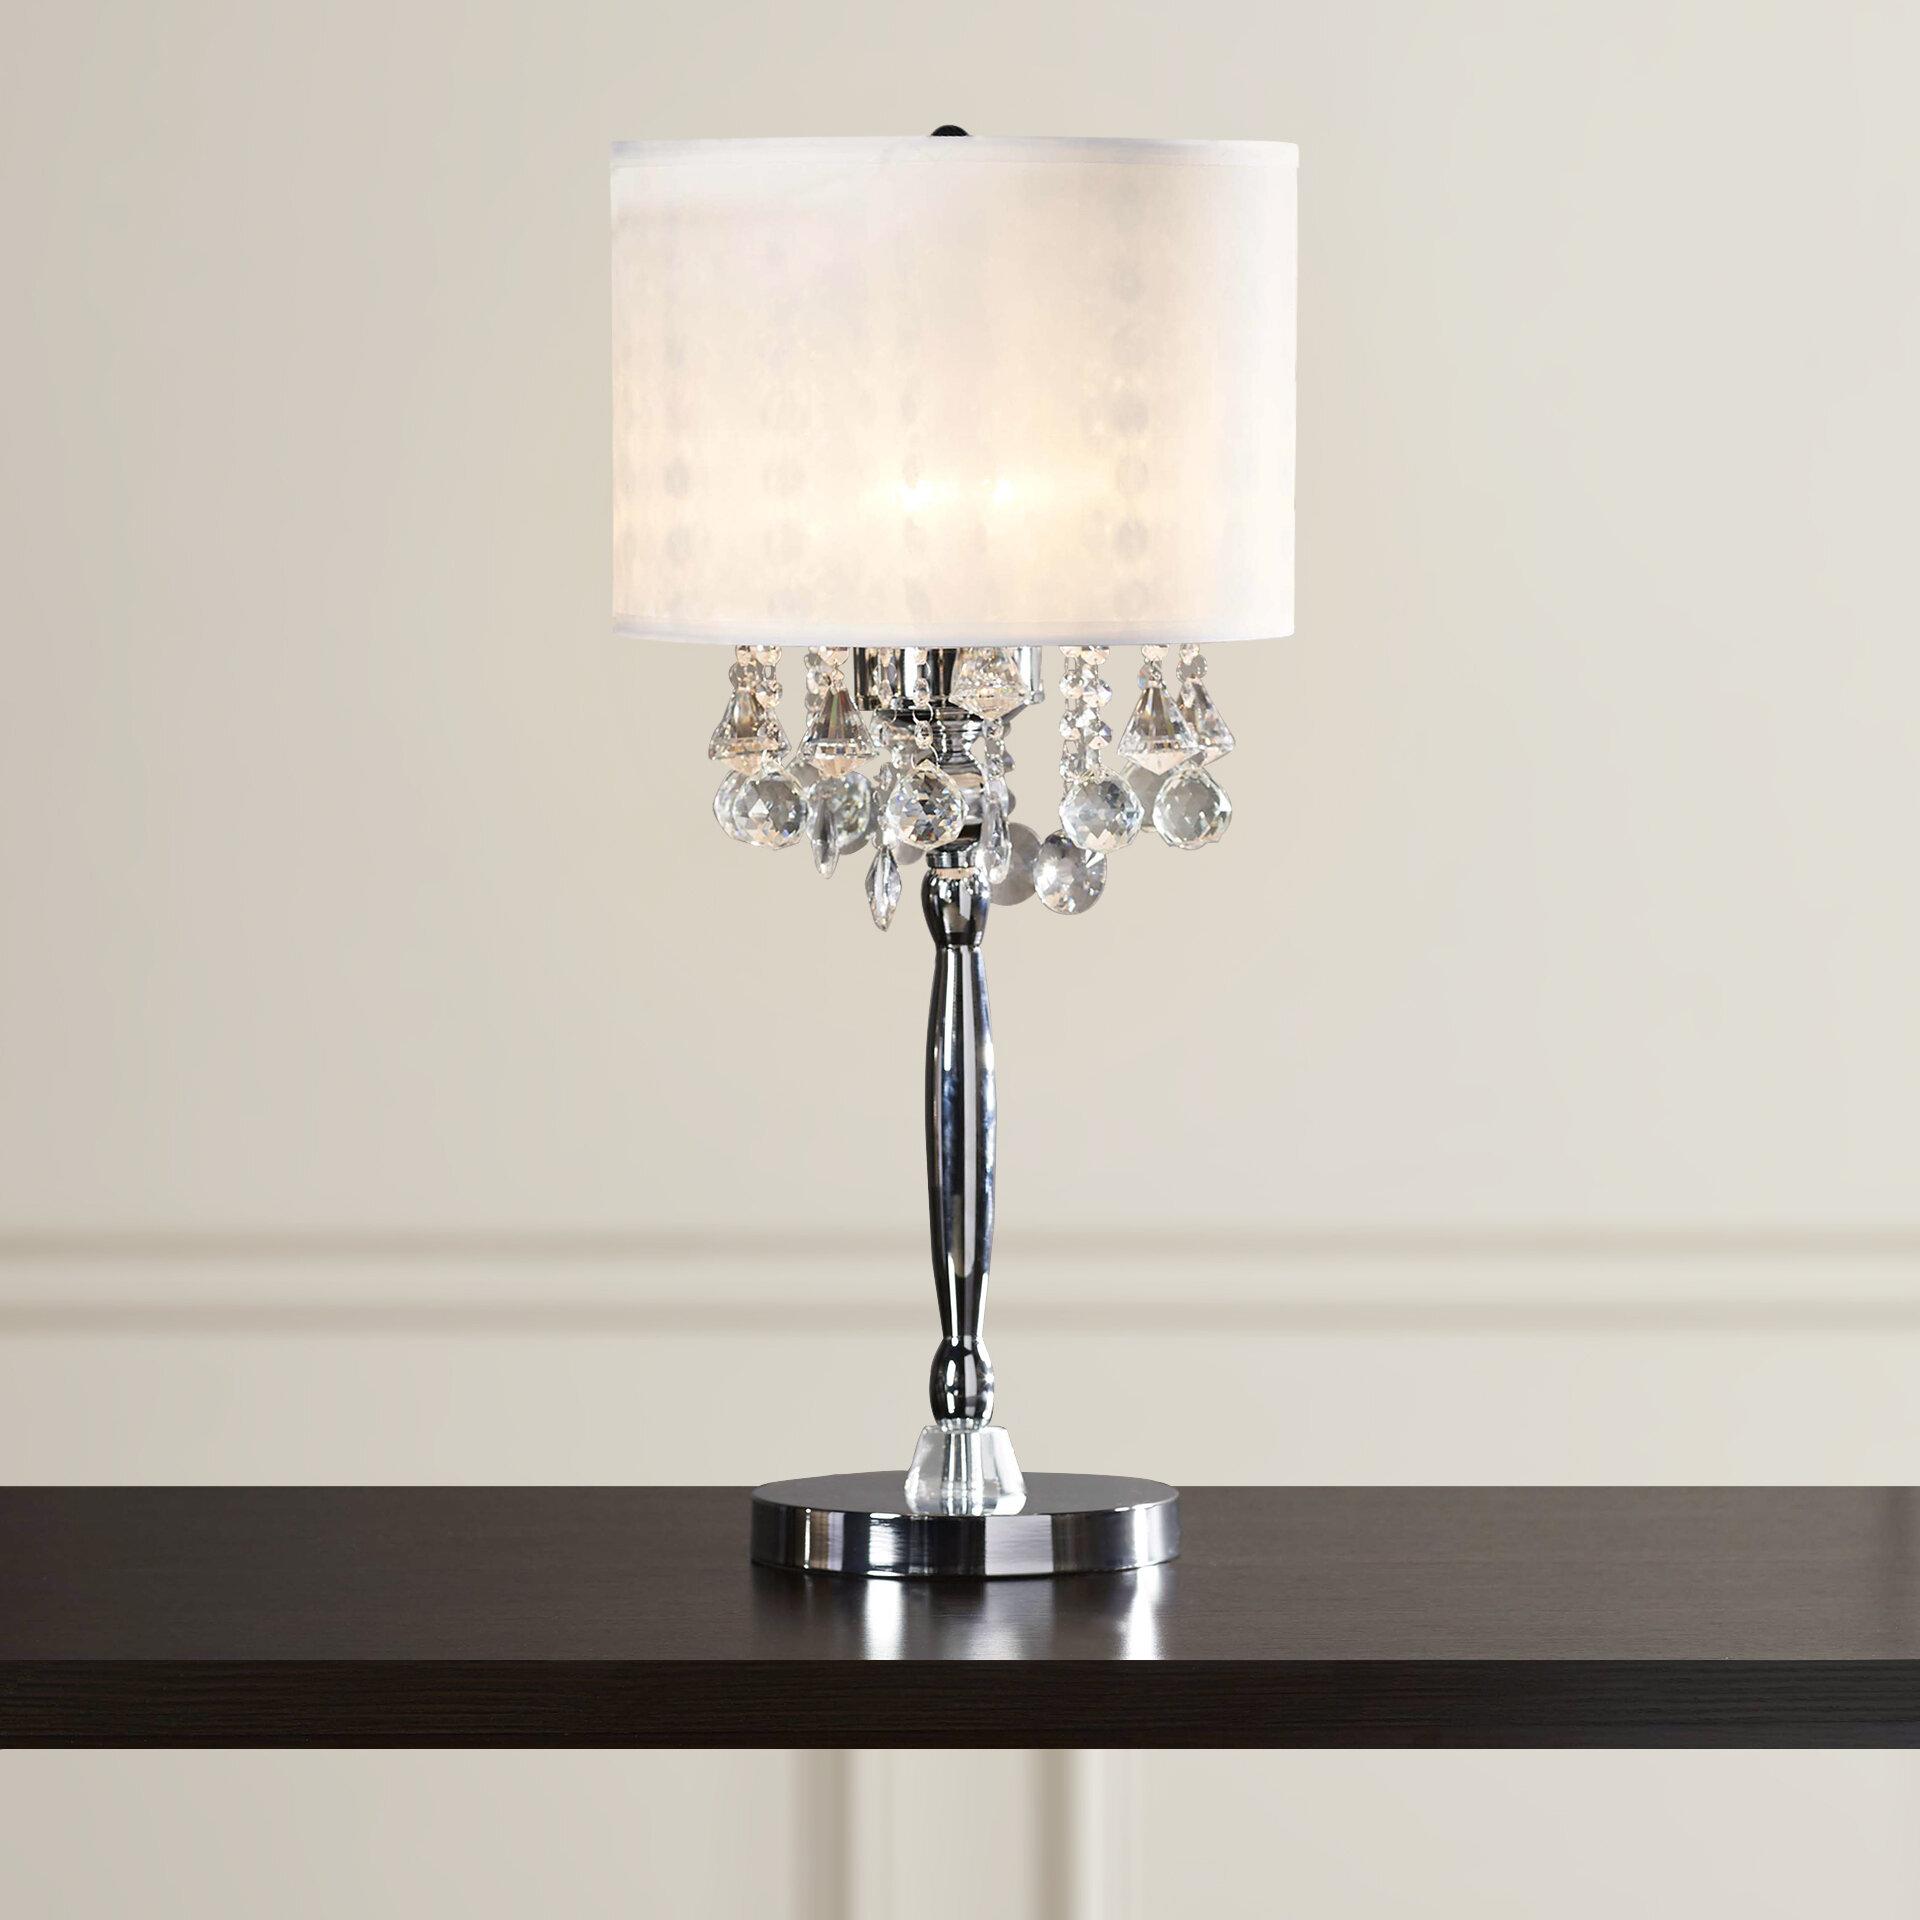 Willa Arlo Interiors Kitson Crystal 3 Light 30 Table Lamp With Drum Shade Reviews Wayfair